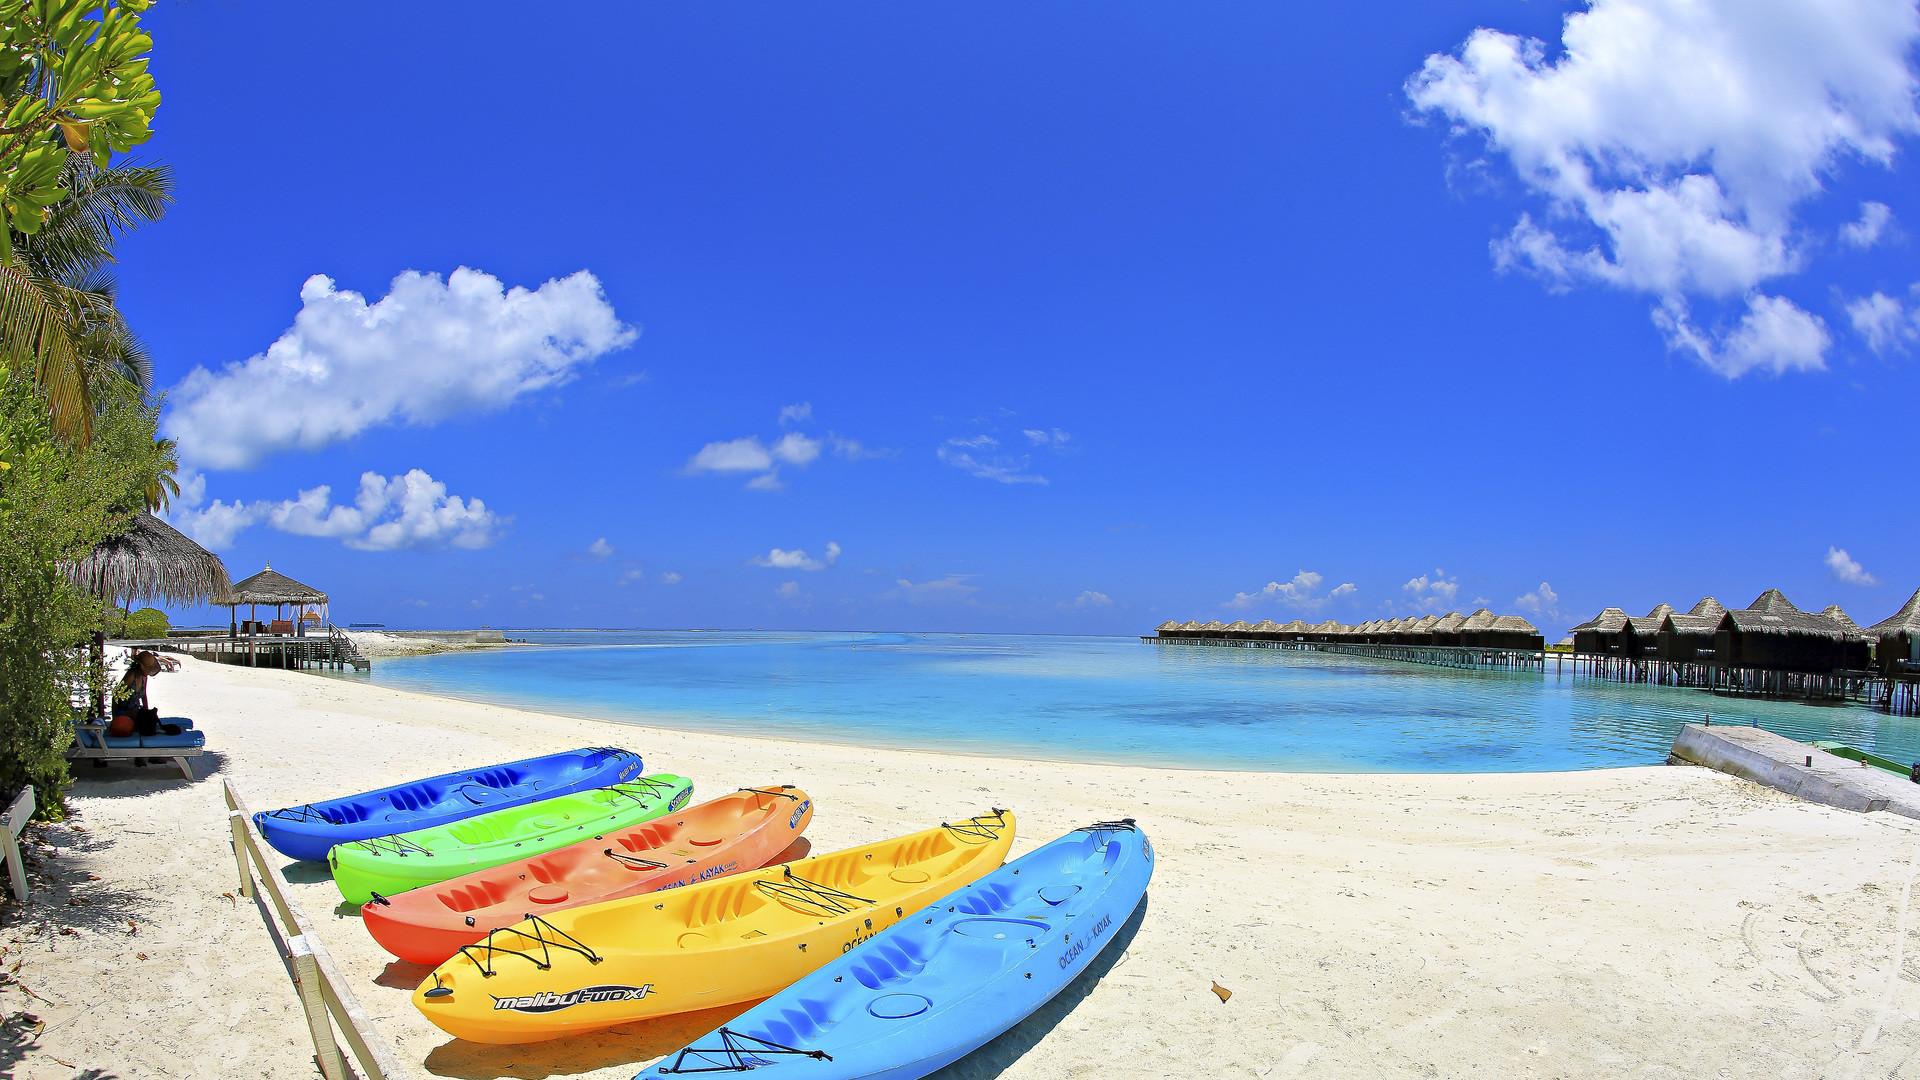 10 Top Sunny Beach Wallpaper Hd Full Hd 1920 1080 For Pc: HD Wallpaper Beach (69+ Images